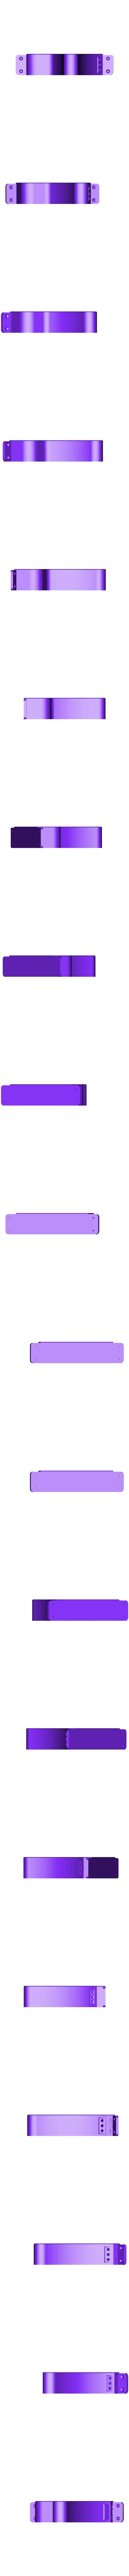 MAIN CASE.stl Download STL file STEAM POWERED FERRIS WHEEL • 3D print model, Boxermad84